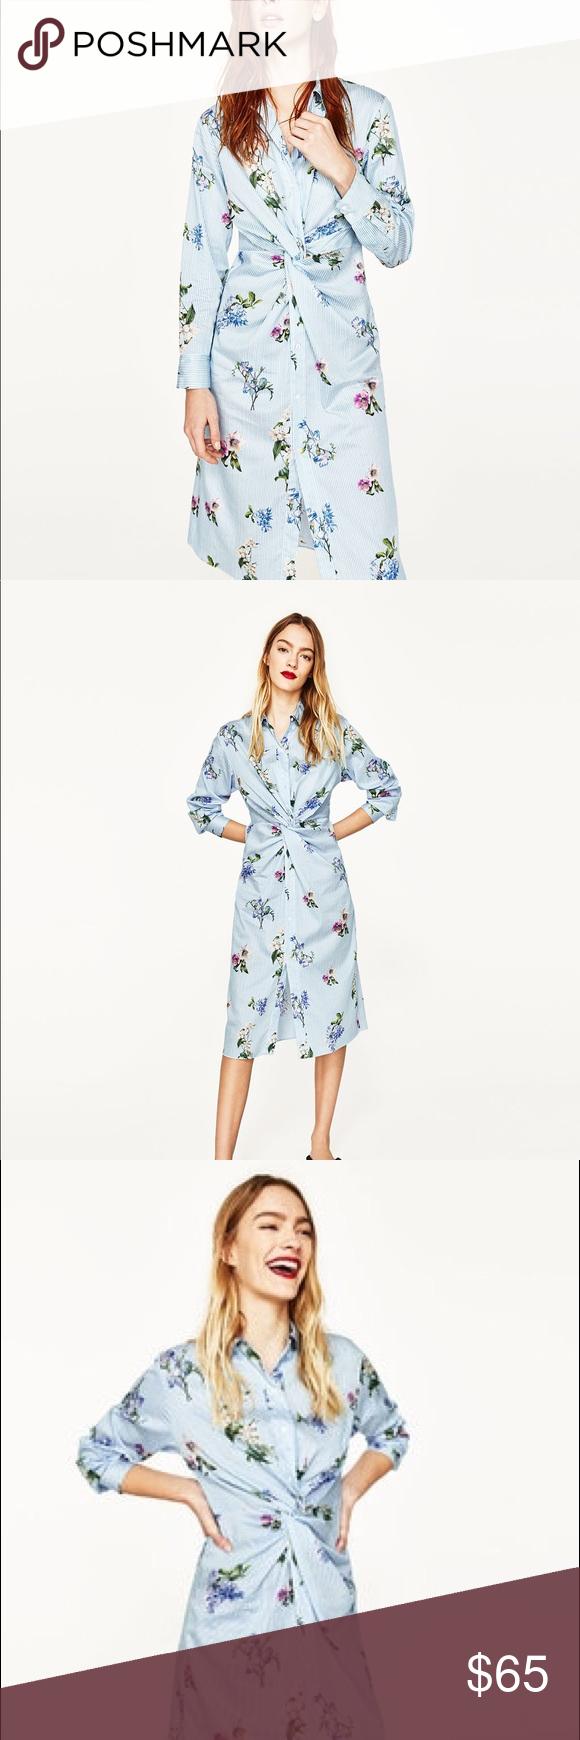 Nwt Zara Knotted Floral Striped Shirt Dress Nwt My Posh Picks